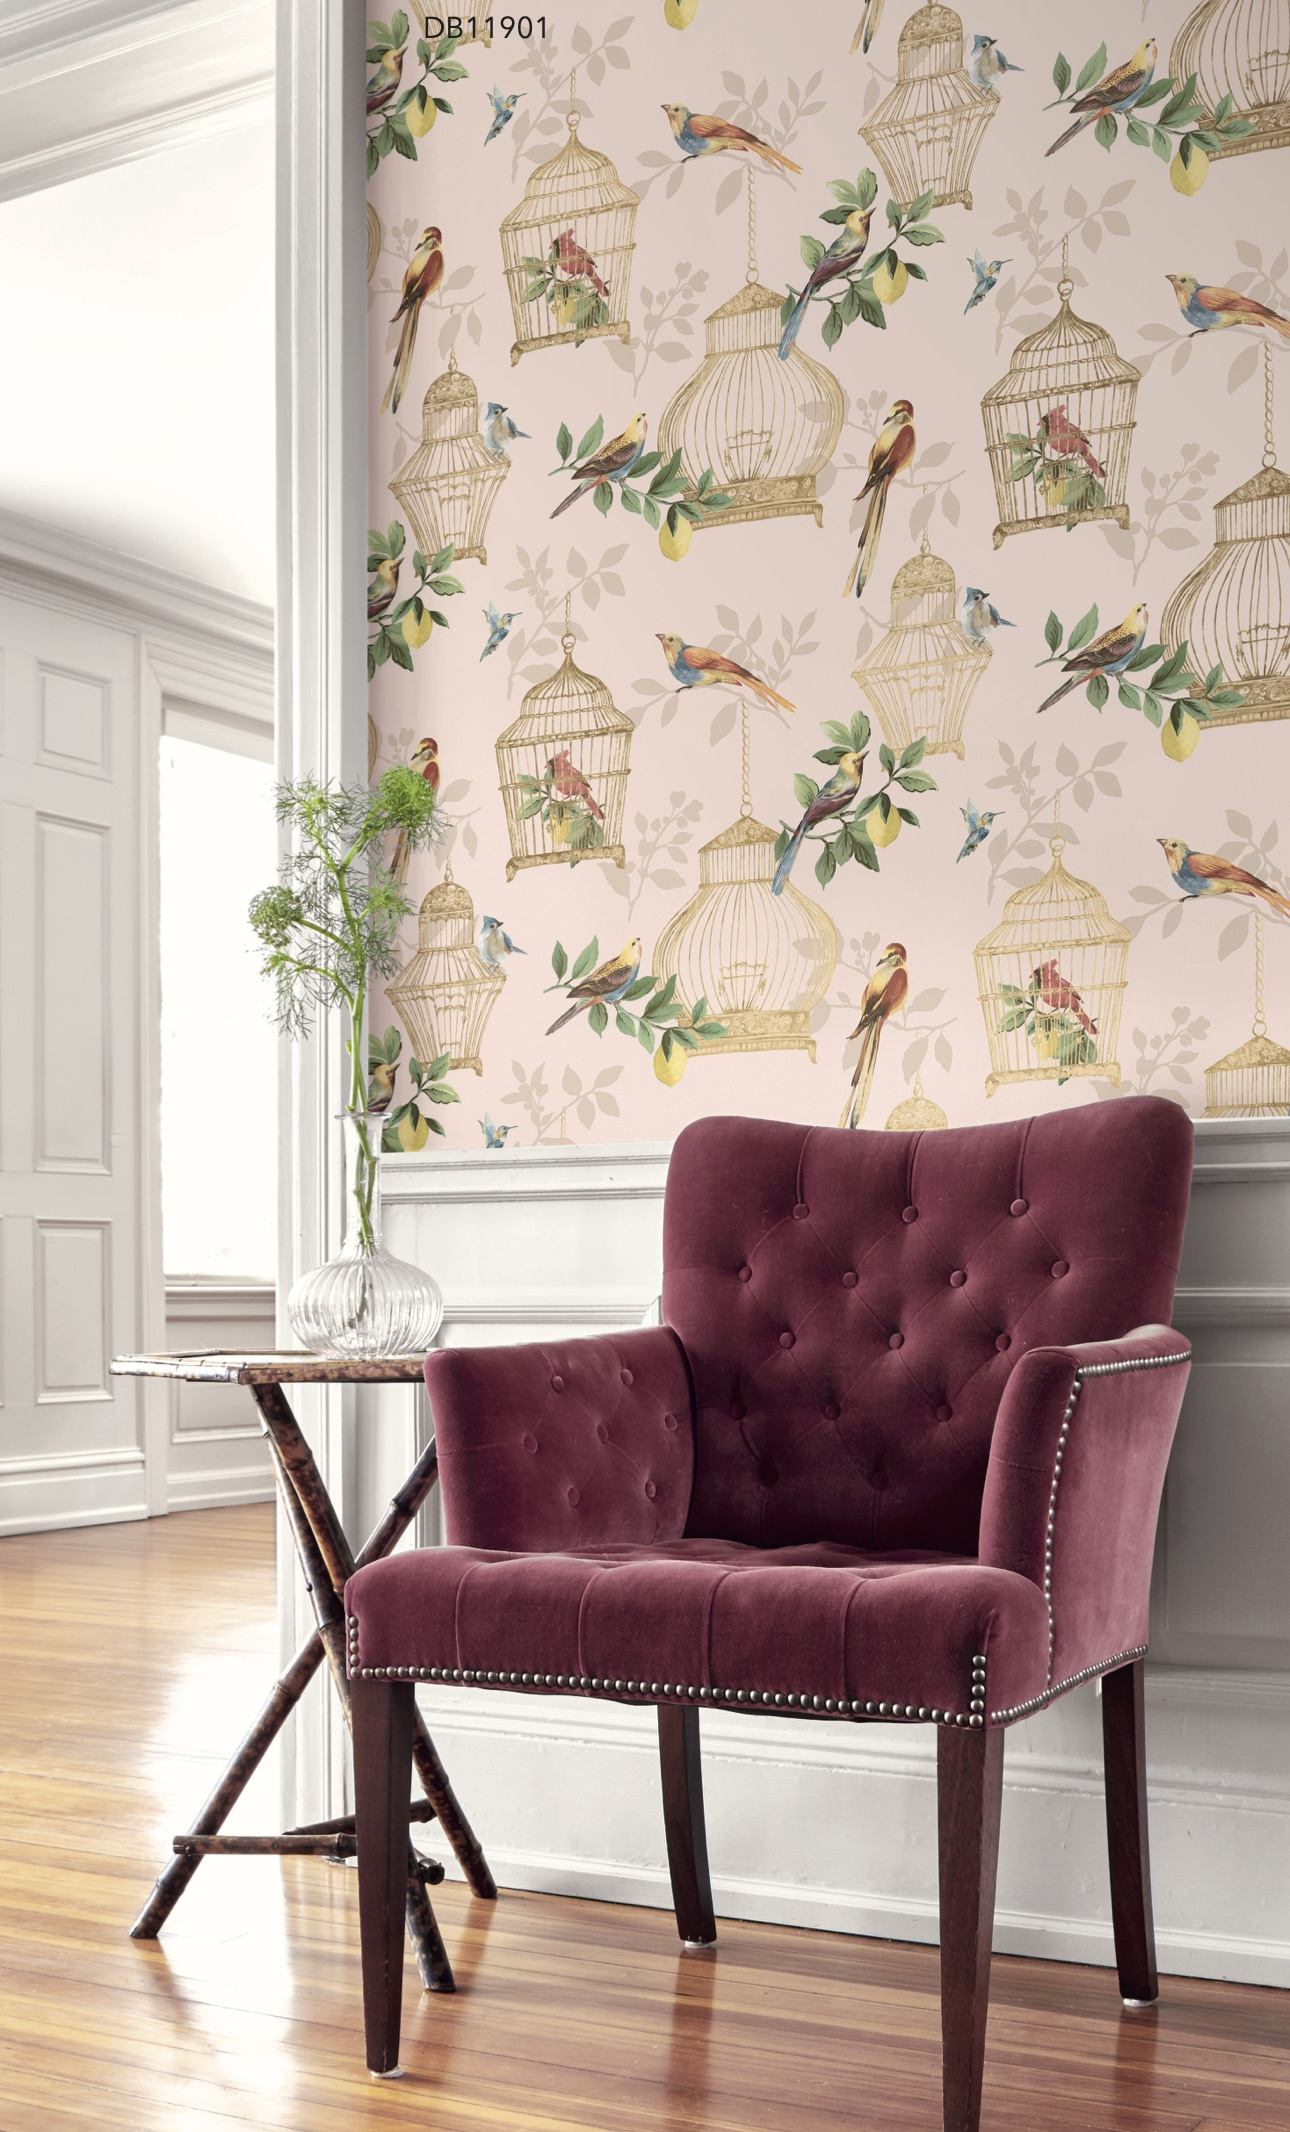 Blush Audubon Wallpaper